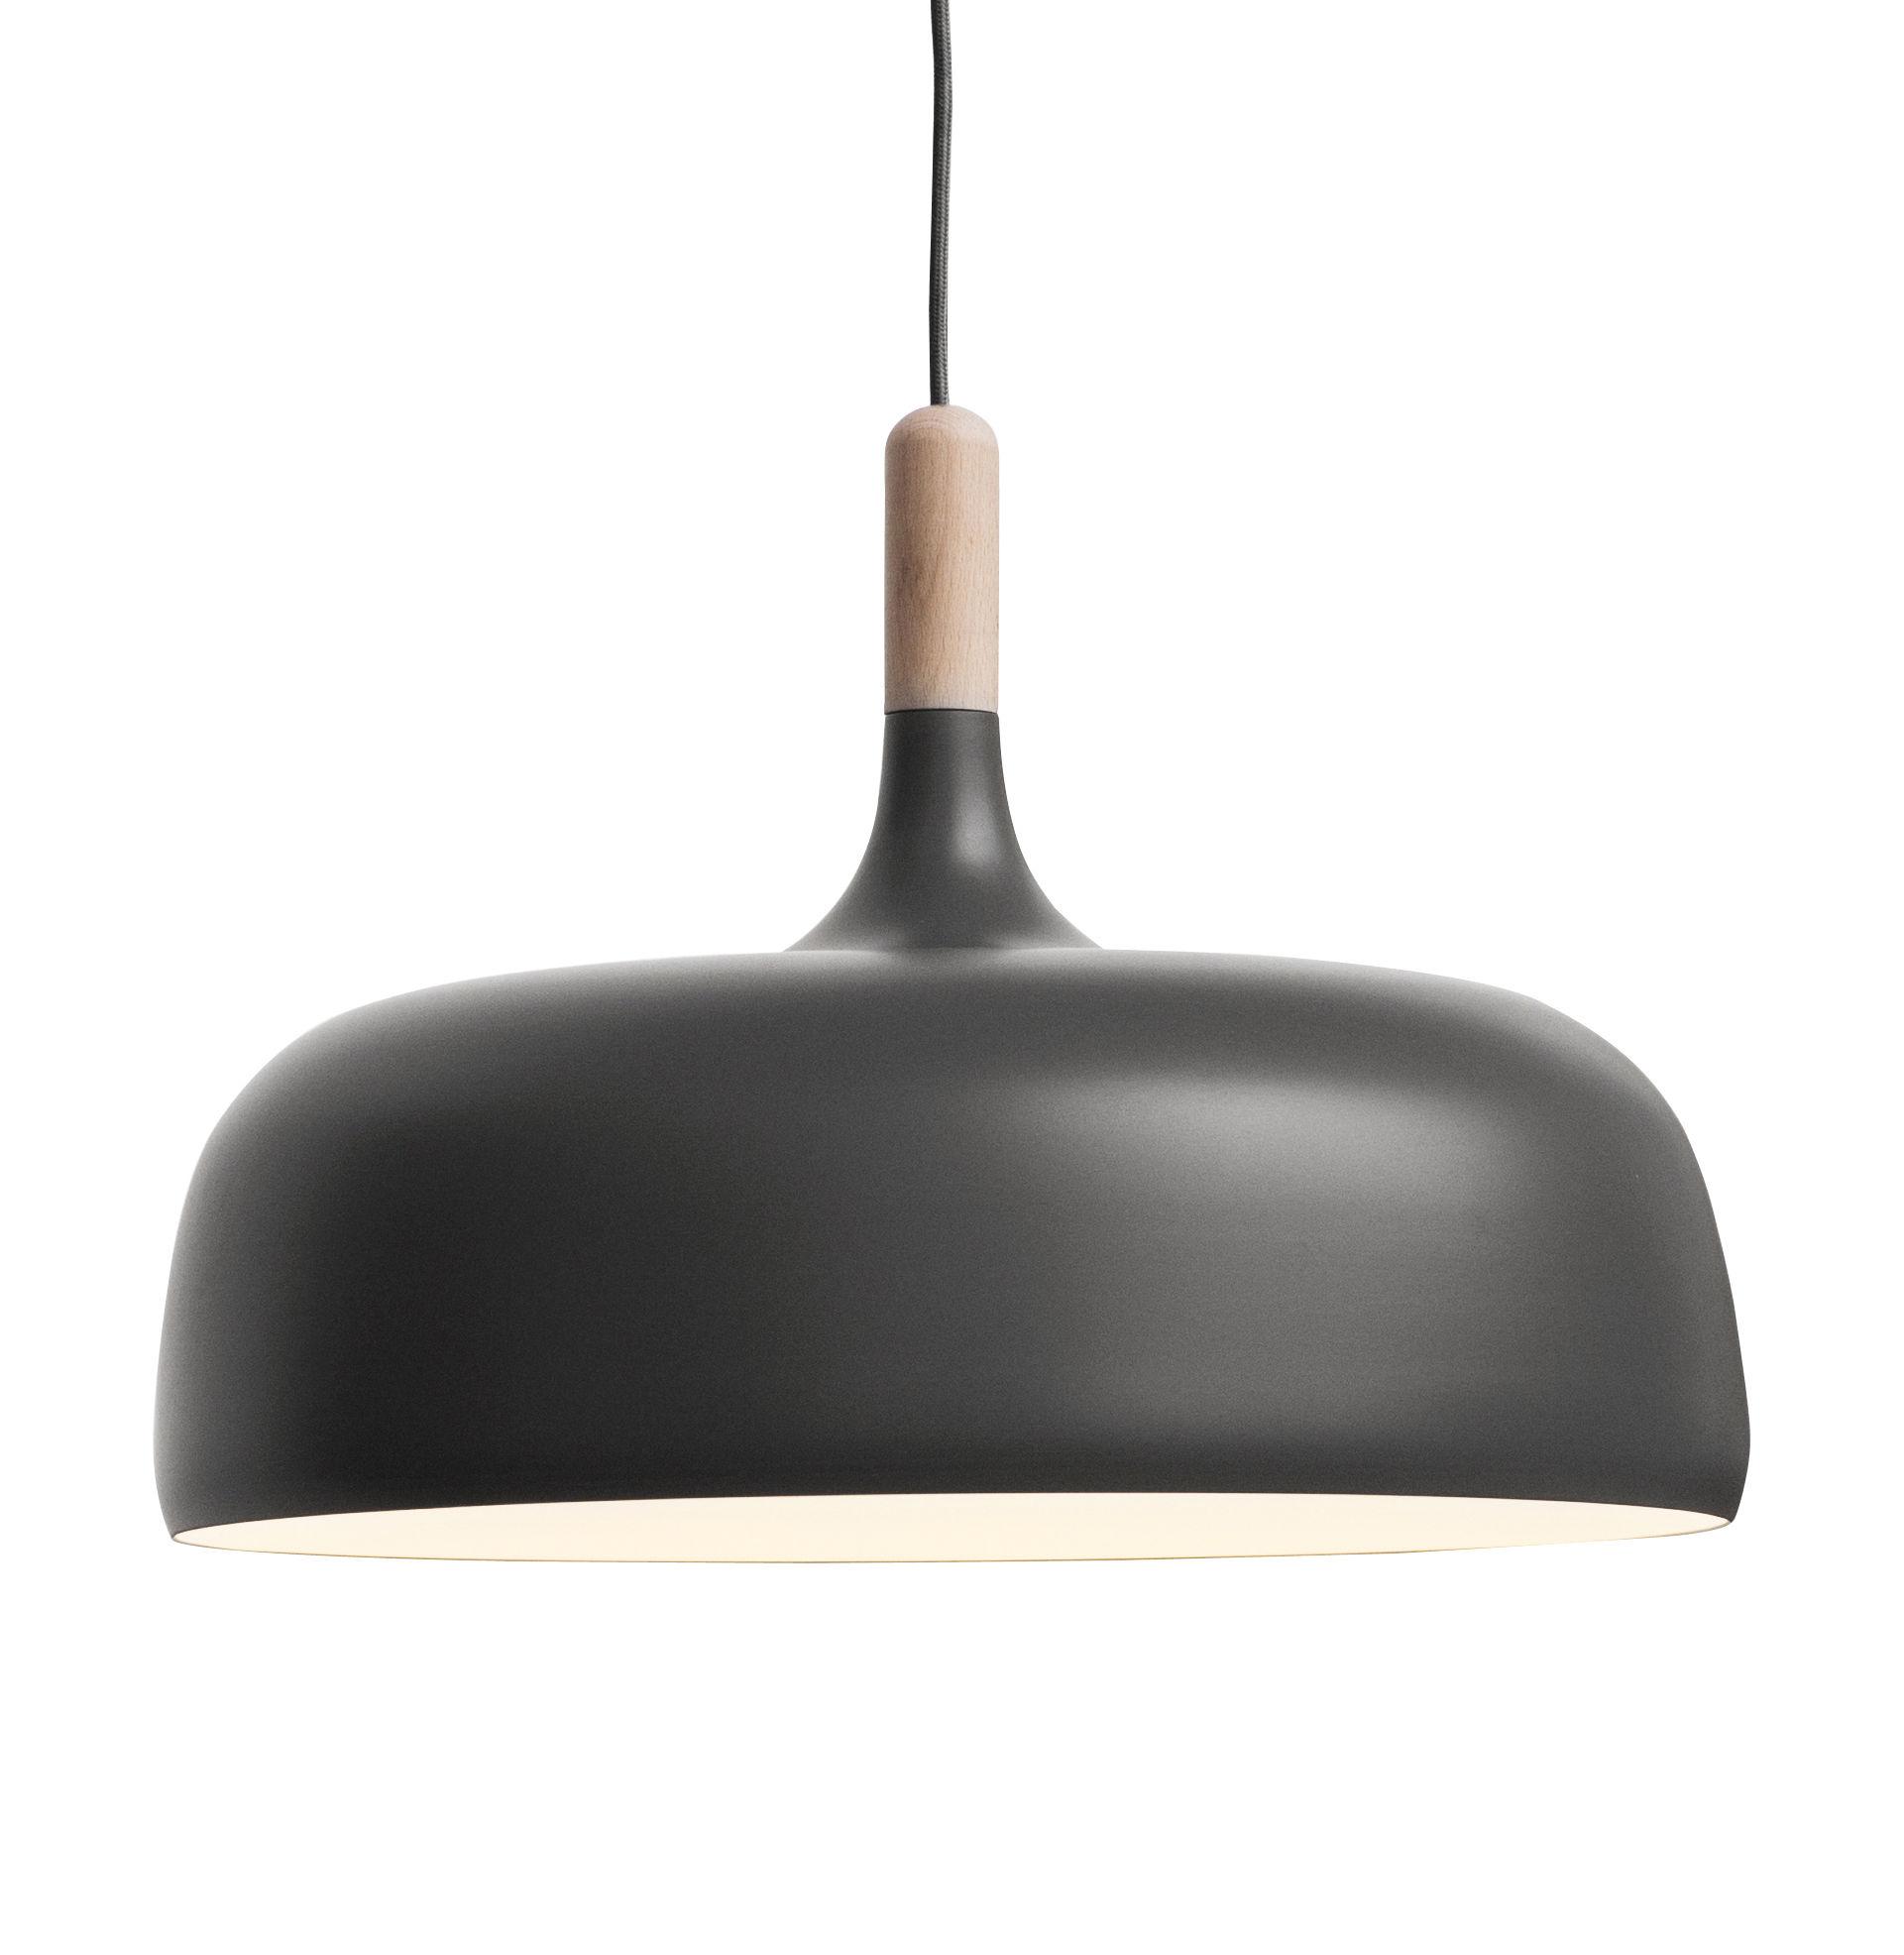 Lighting - Pendant Lighting - Acorn Pendant by Northern  - Grey, Natural Wood - Aluminium, Oak